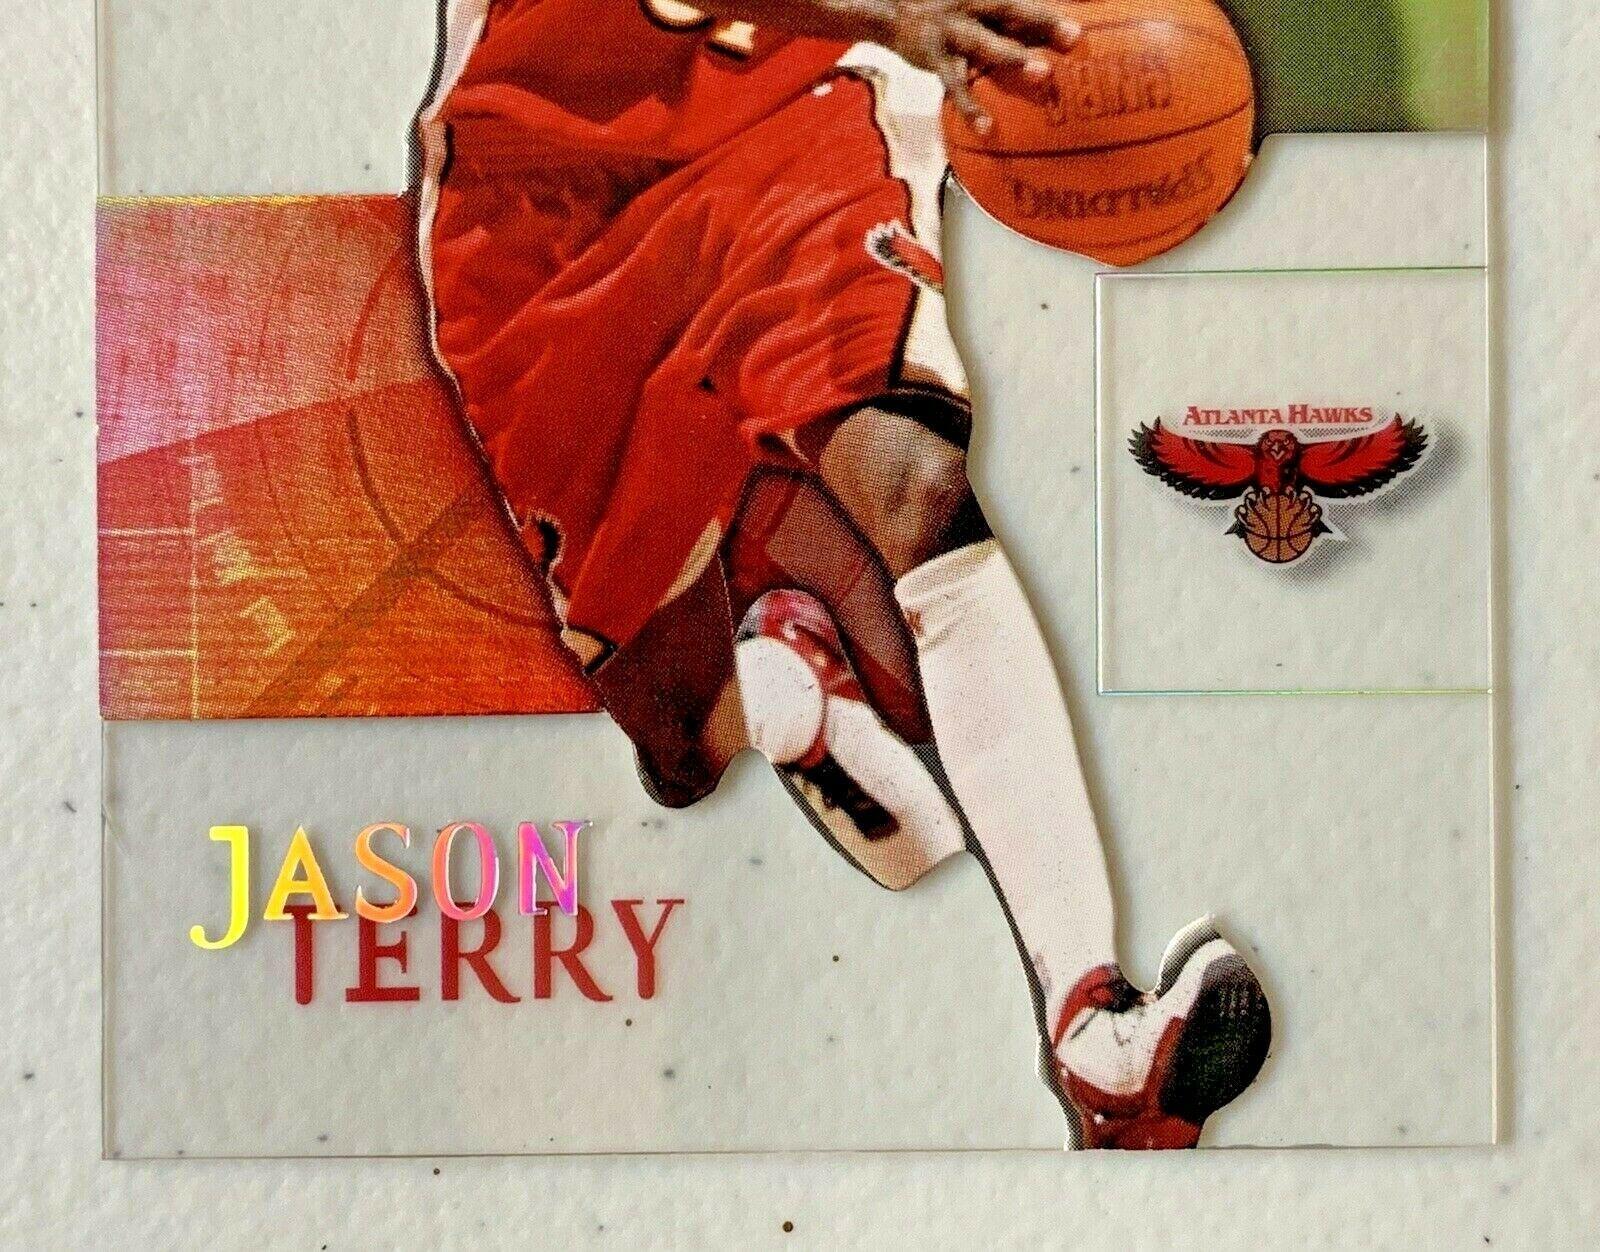 Jason Terry Now/66 #65 Atlanta Hawks Fleer Basketball Card with Hard Case 31G image 4